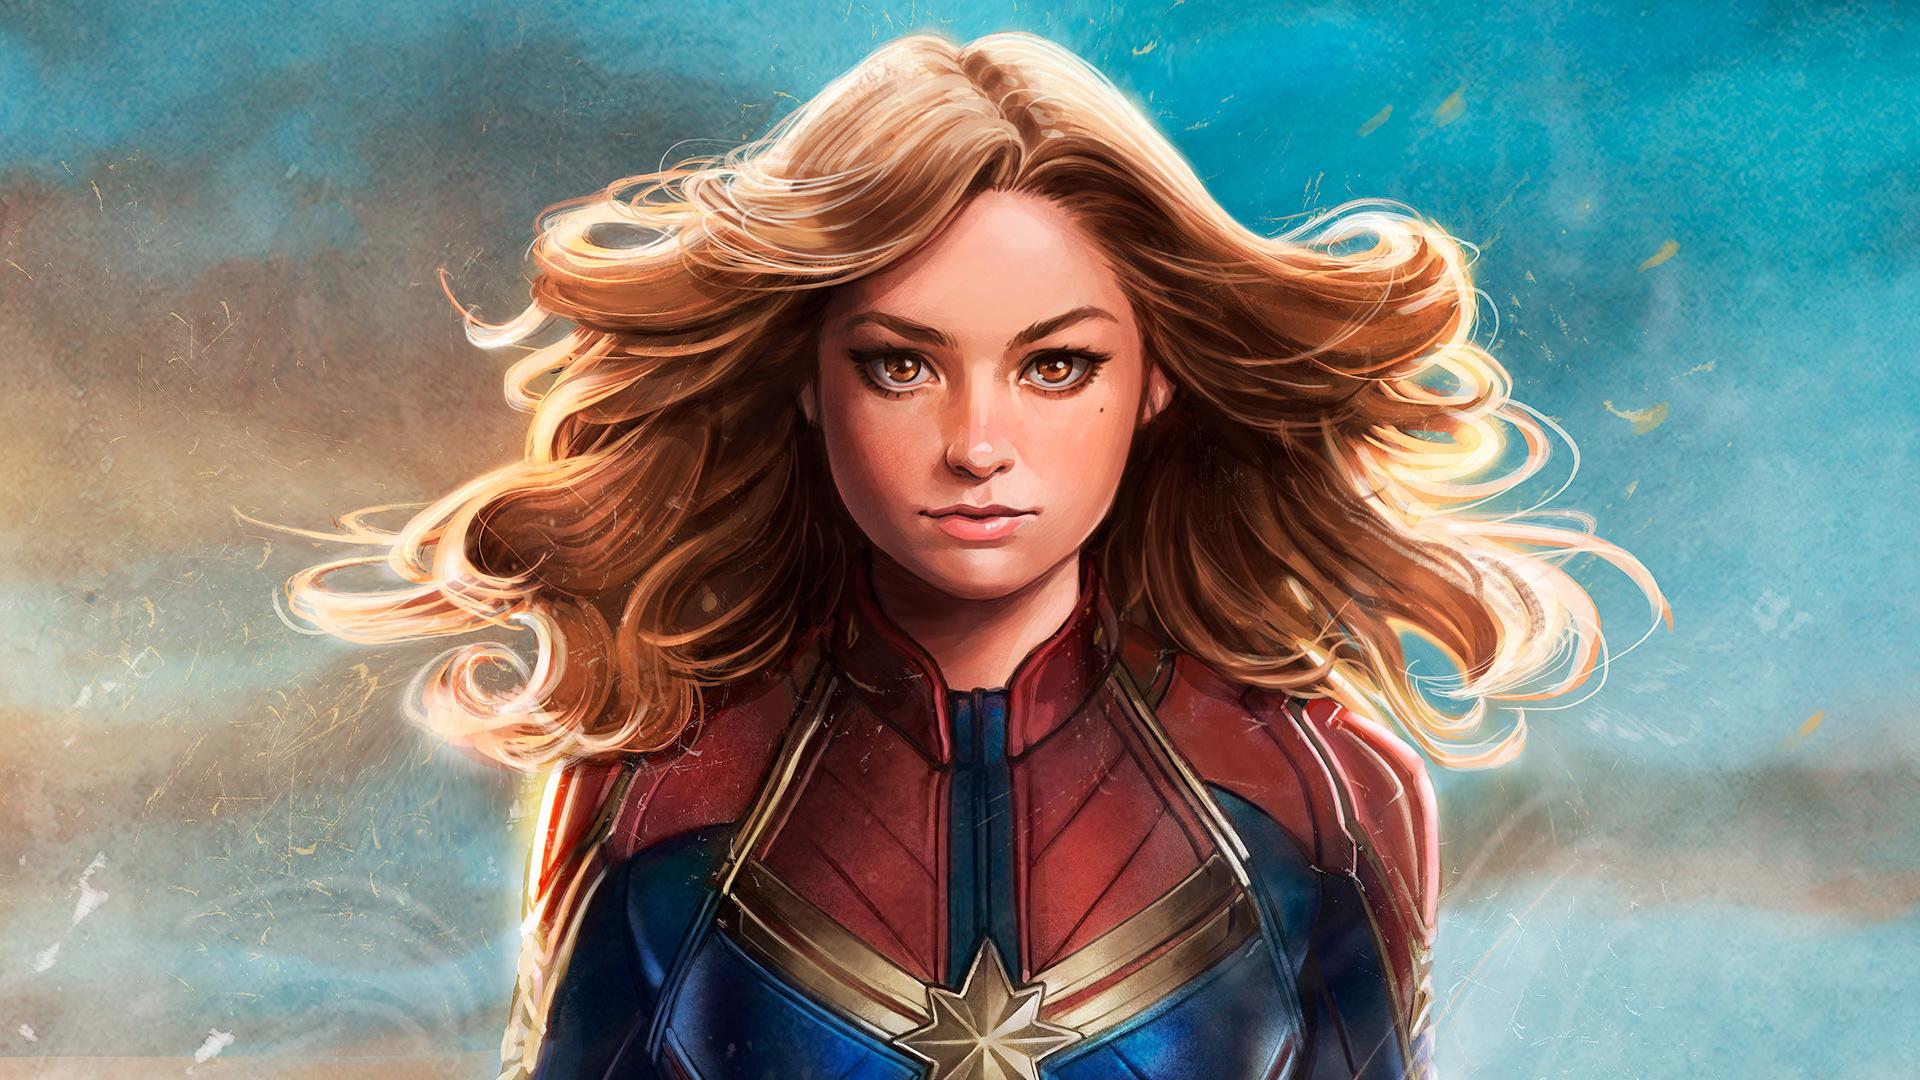 Captain Marvel Fantasy Art Wallpapers Hd Desktop And: Captain Marvel New Artwork, HD Superheroes, 4k Wallpapers